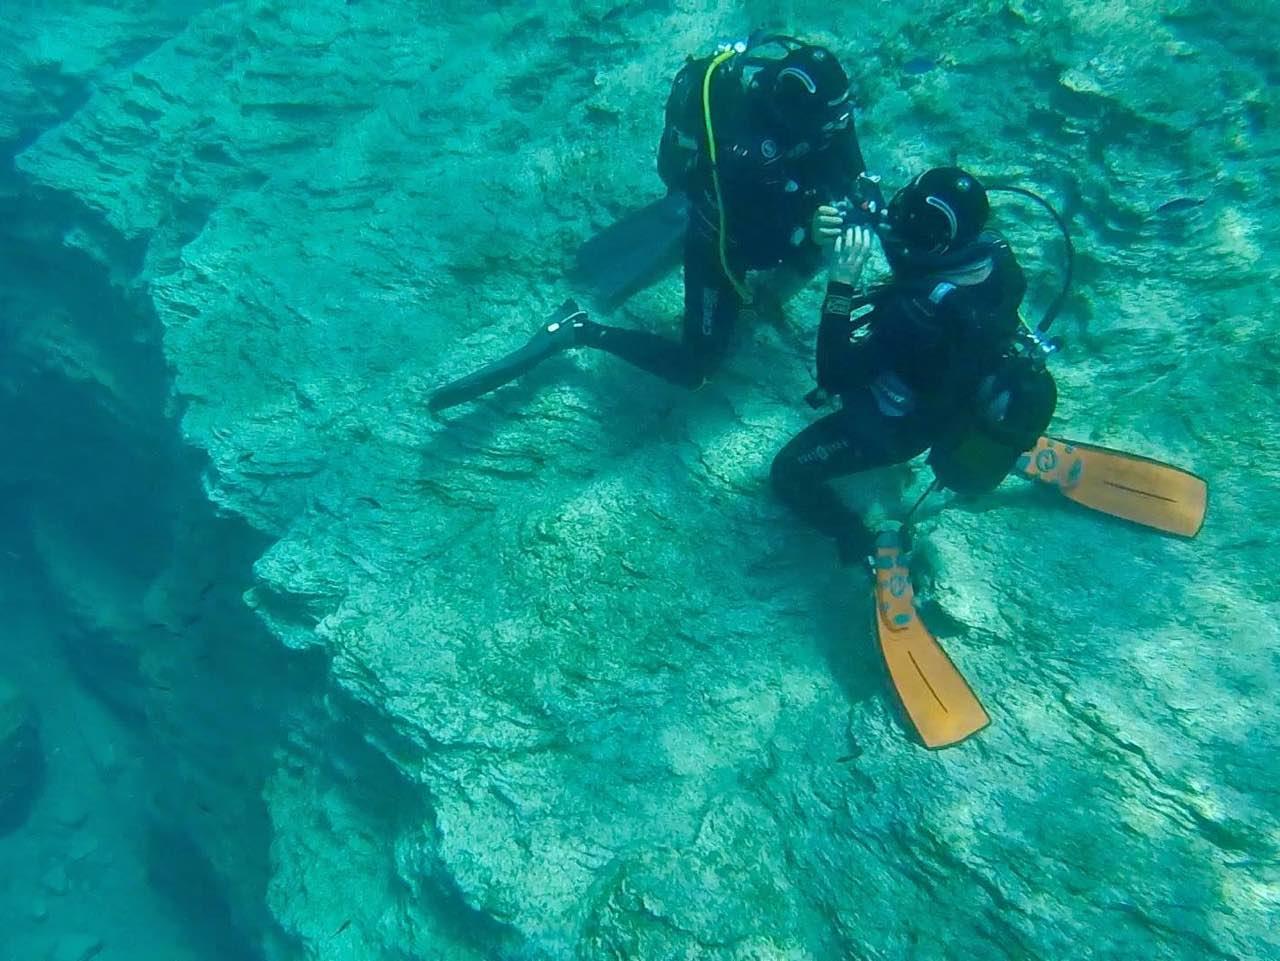 Scuba Diving Sfakia Crete, certified instructors diving chania sfakia, scuba diving south chania, Qualified Advanced Divers, DAN insurance coverage diving chania sfakia, sfakia best activities, south chania best activities